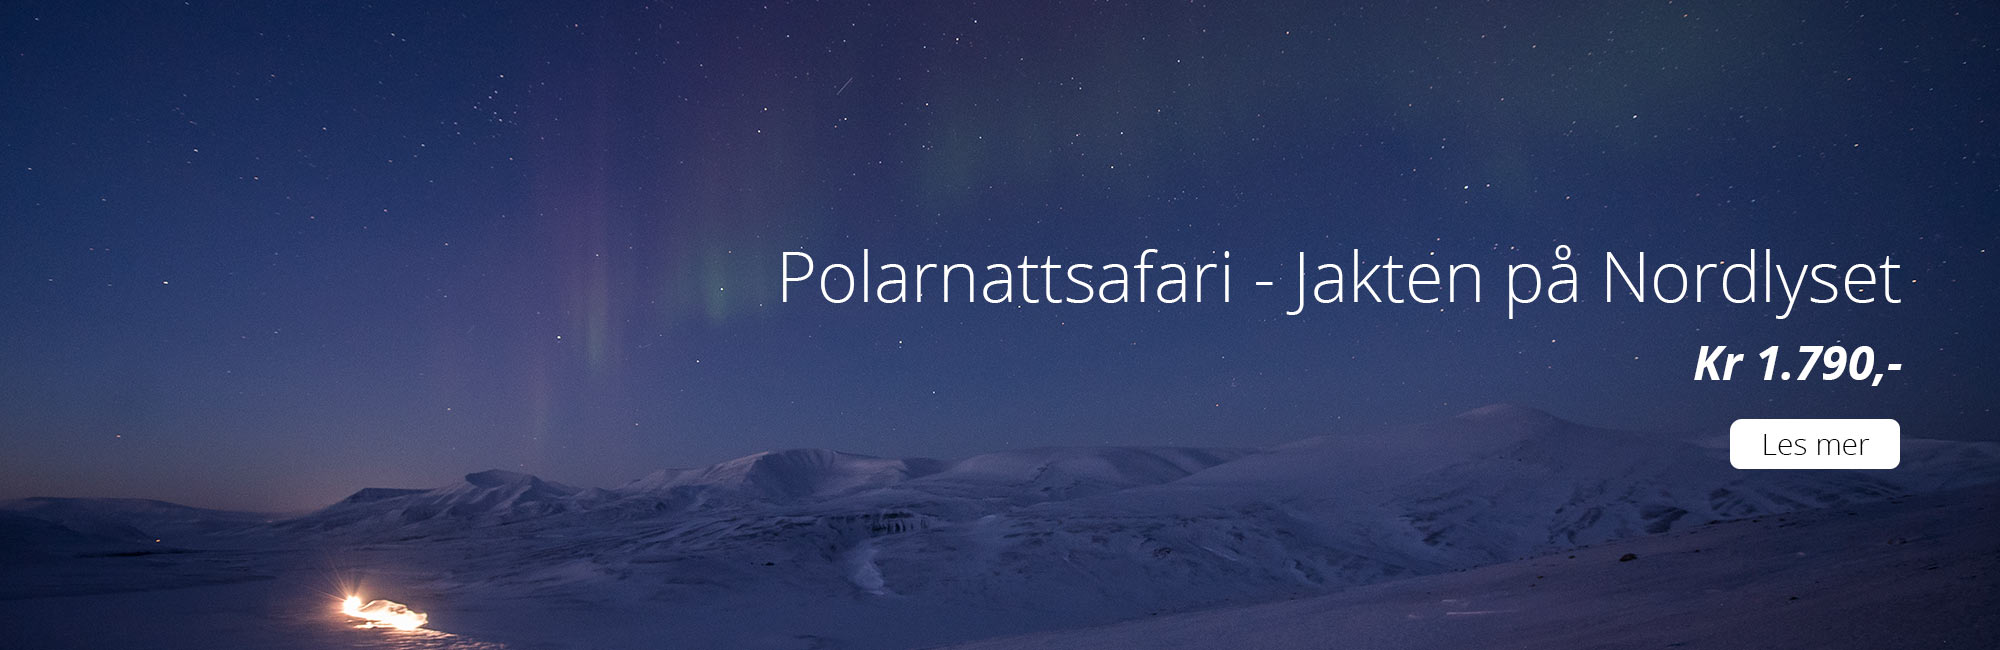 Polarnattsafari - jakten på nordlyset